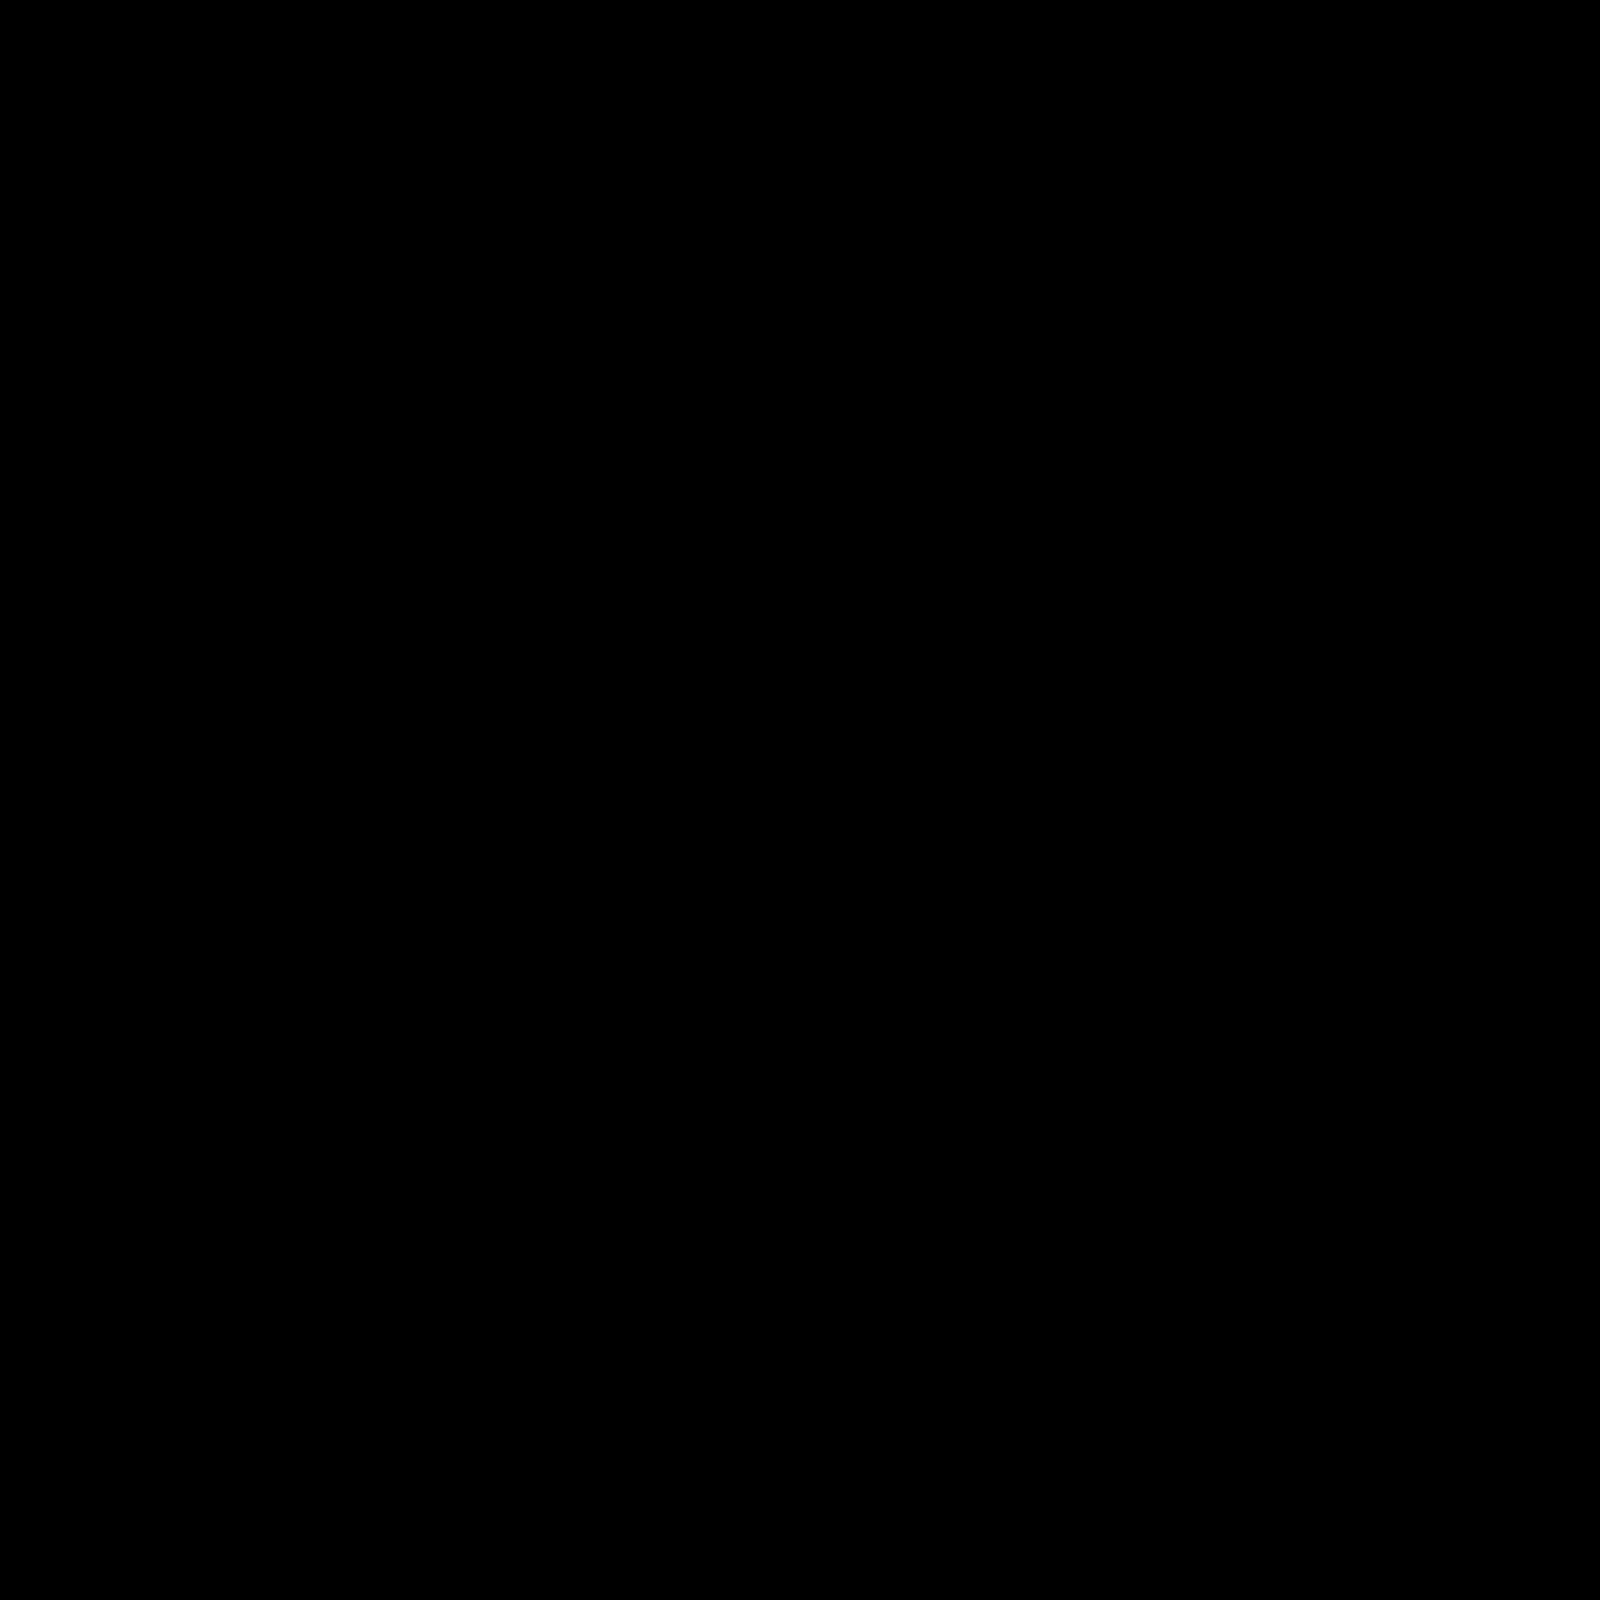 VHS icon